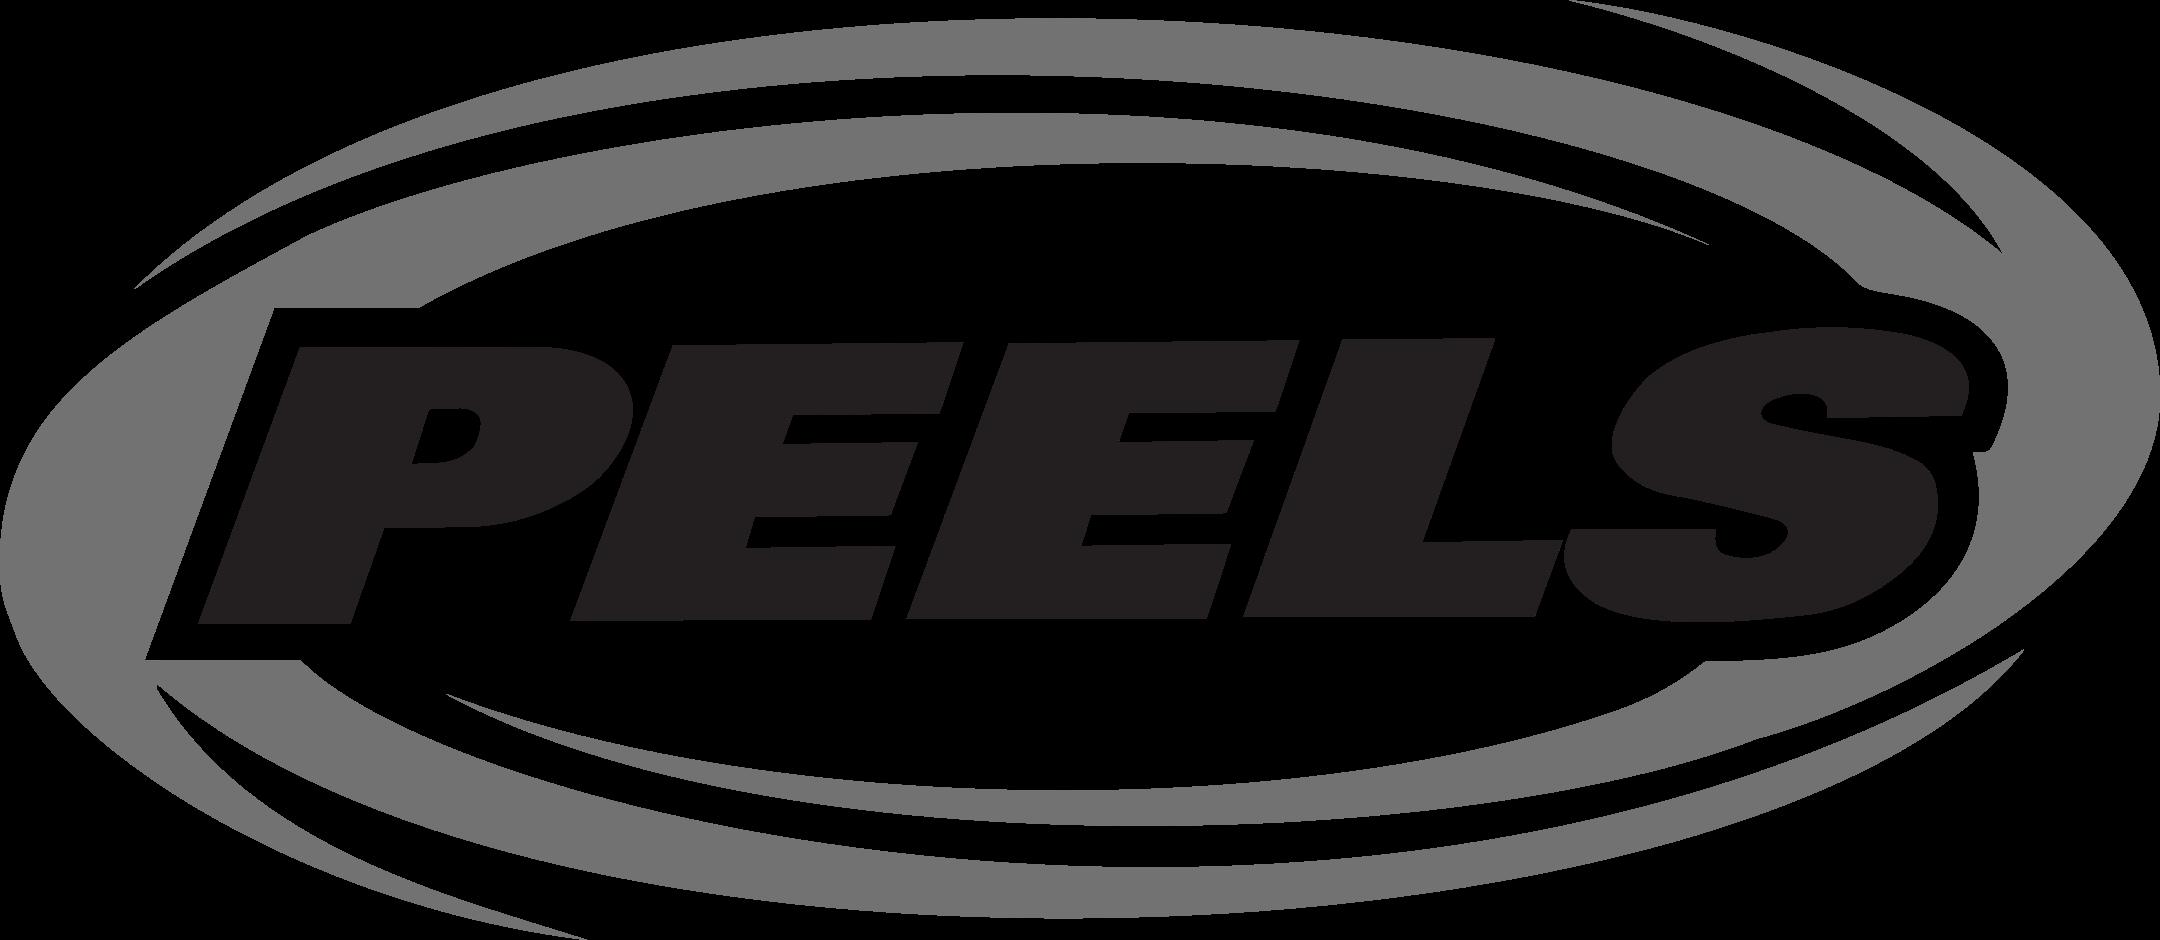 peels logo 1 - PEELS Logo